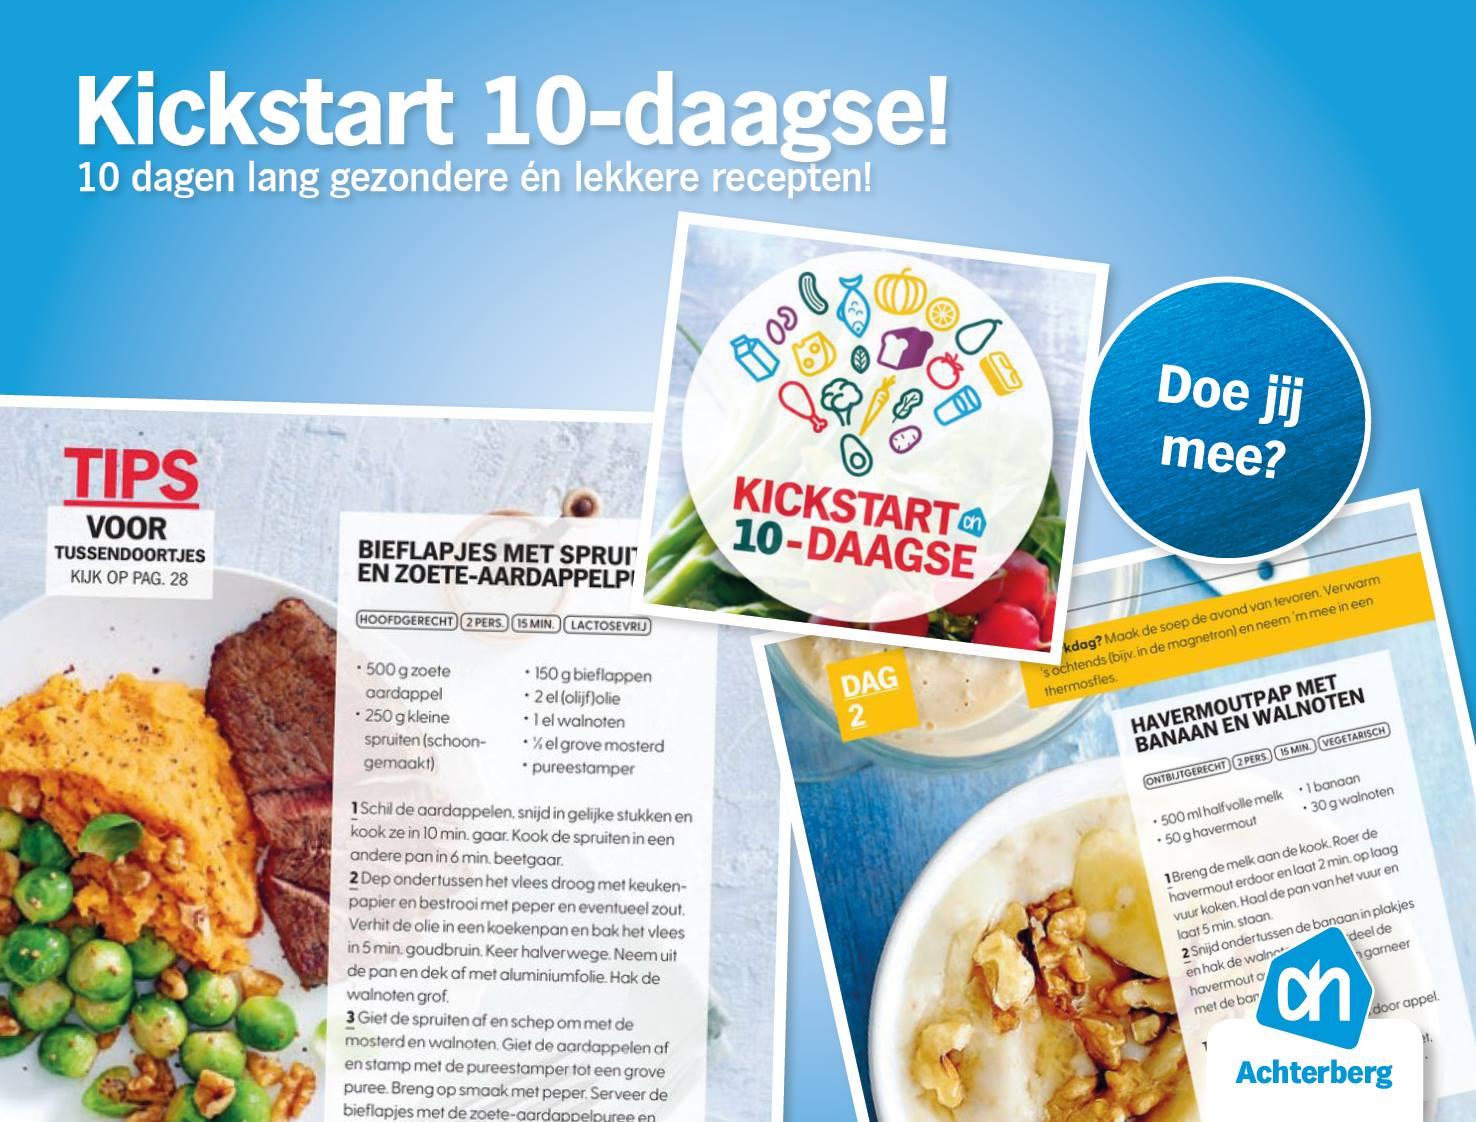 Kickstart 10-daagse!